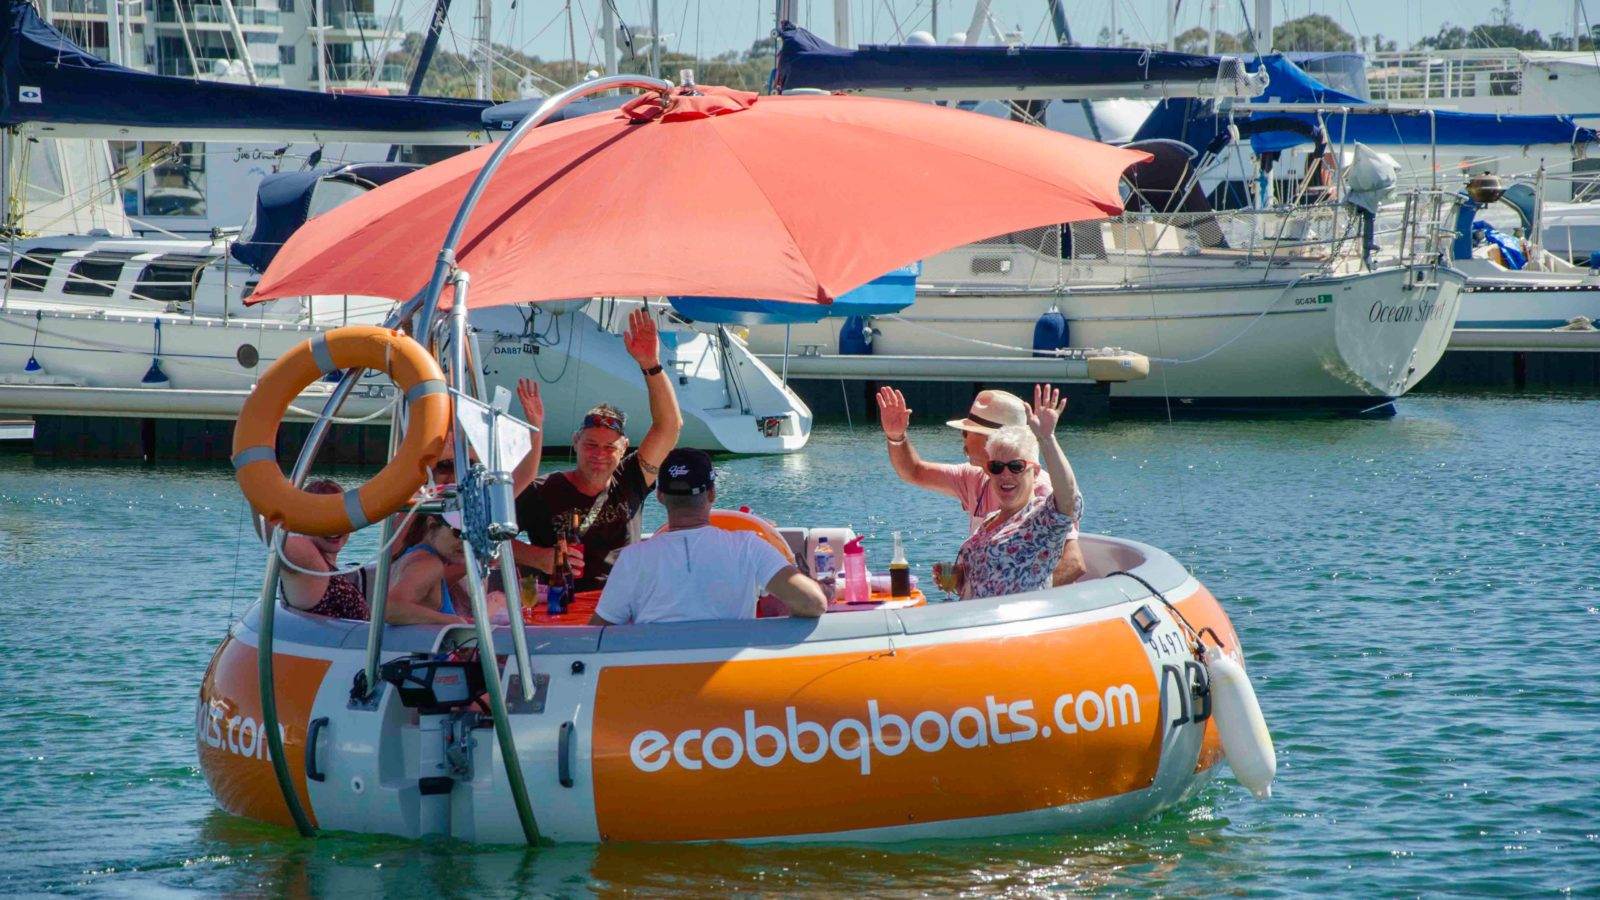 Eco BBQ Boats, Mandurah, Western Australia